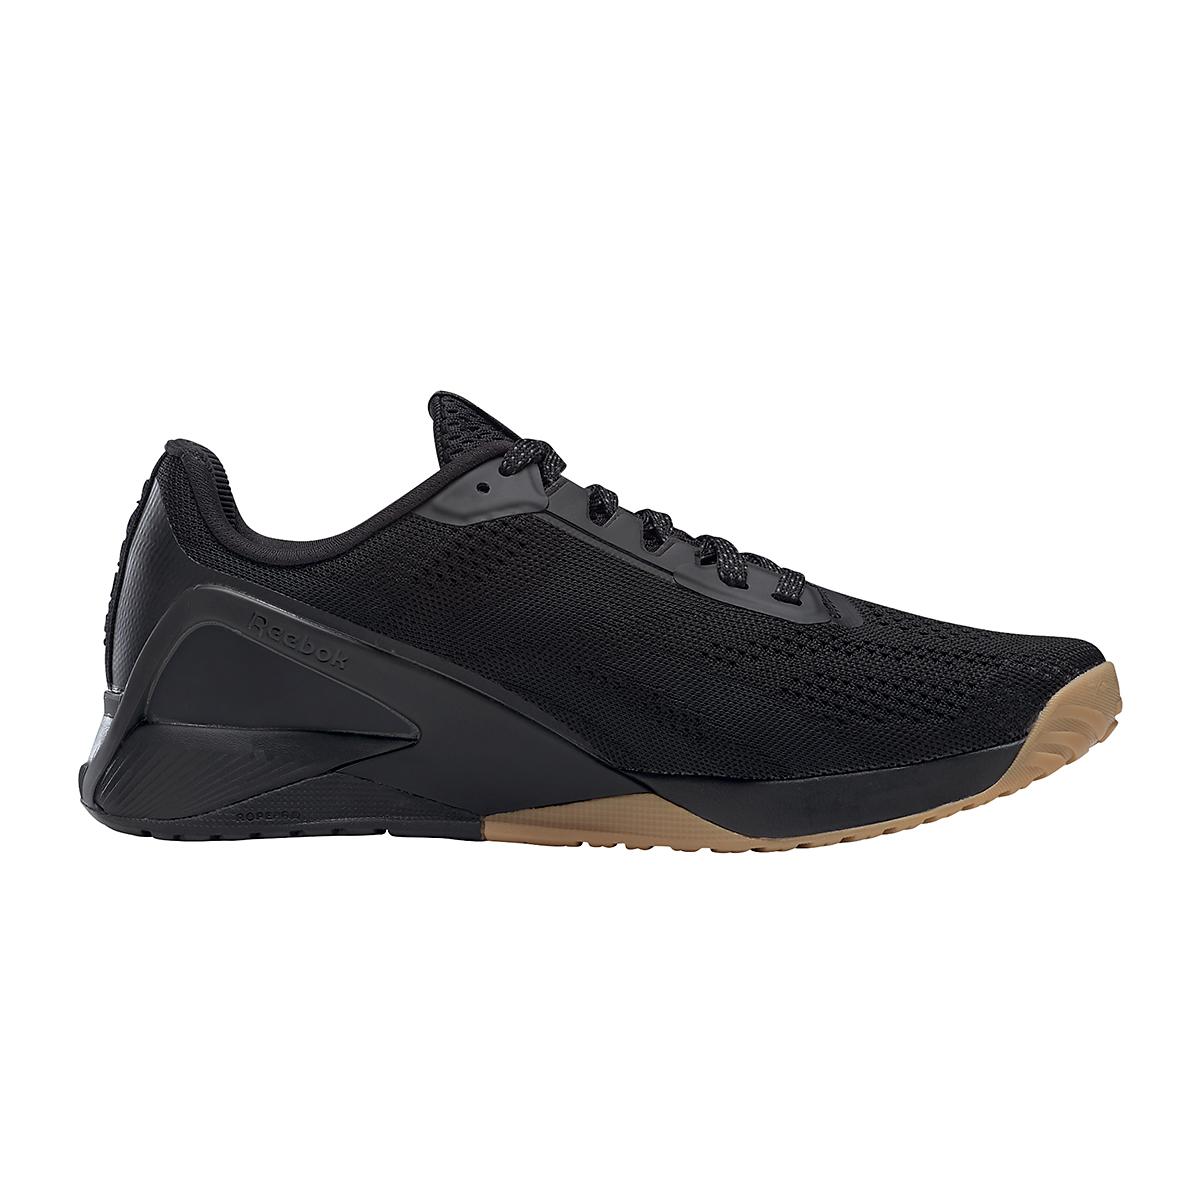 Men's Reebok Nano X1 Training Shoe - Color: Black/Night Black/Rubber Gum - Size: 6.5 - Width: Regular, Black/Night Black/Rubber Gum, large, image 5